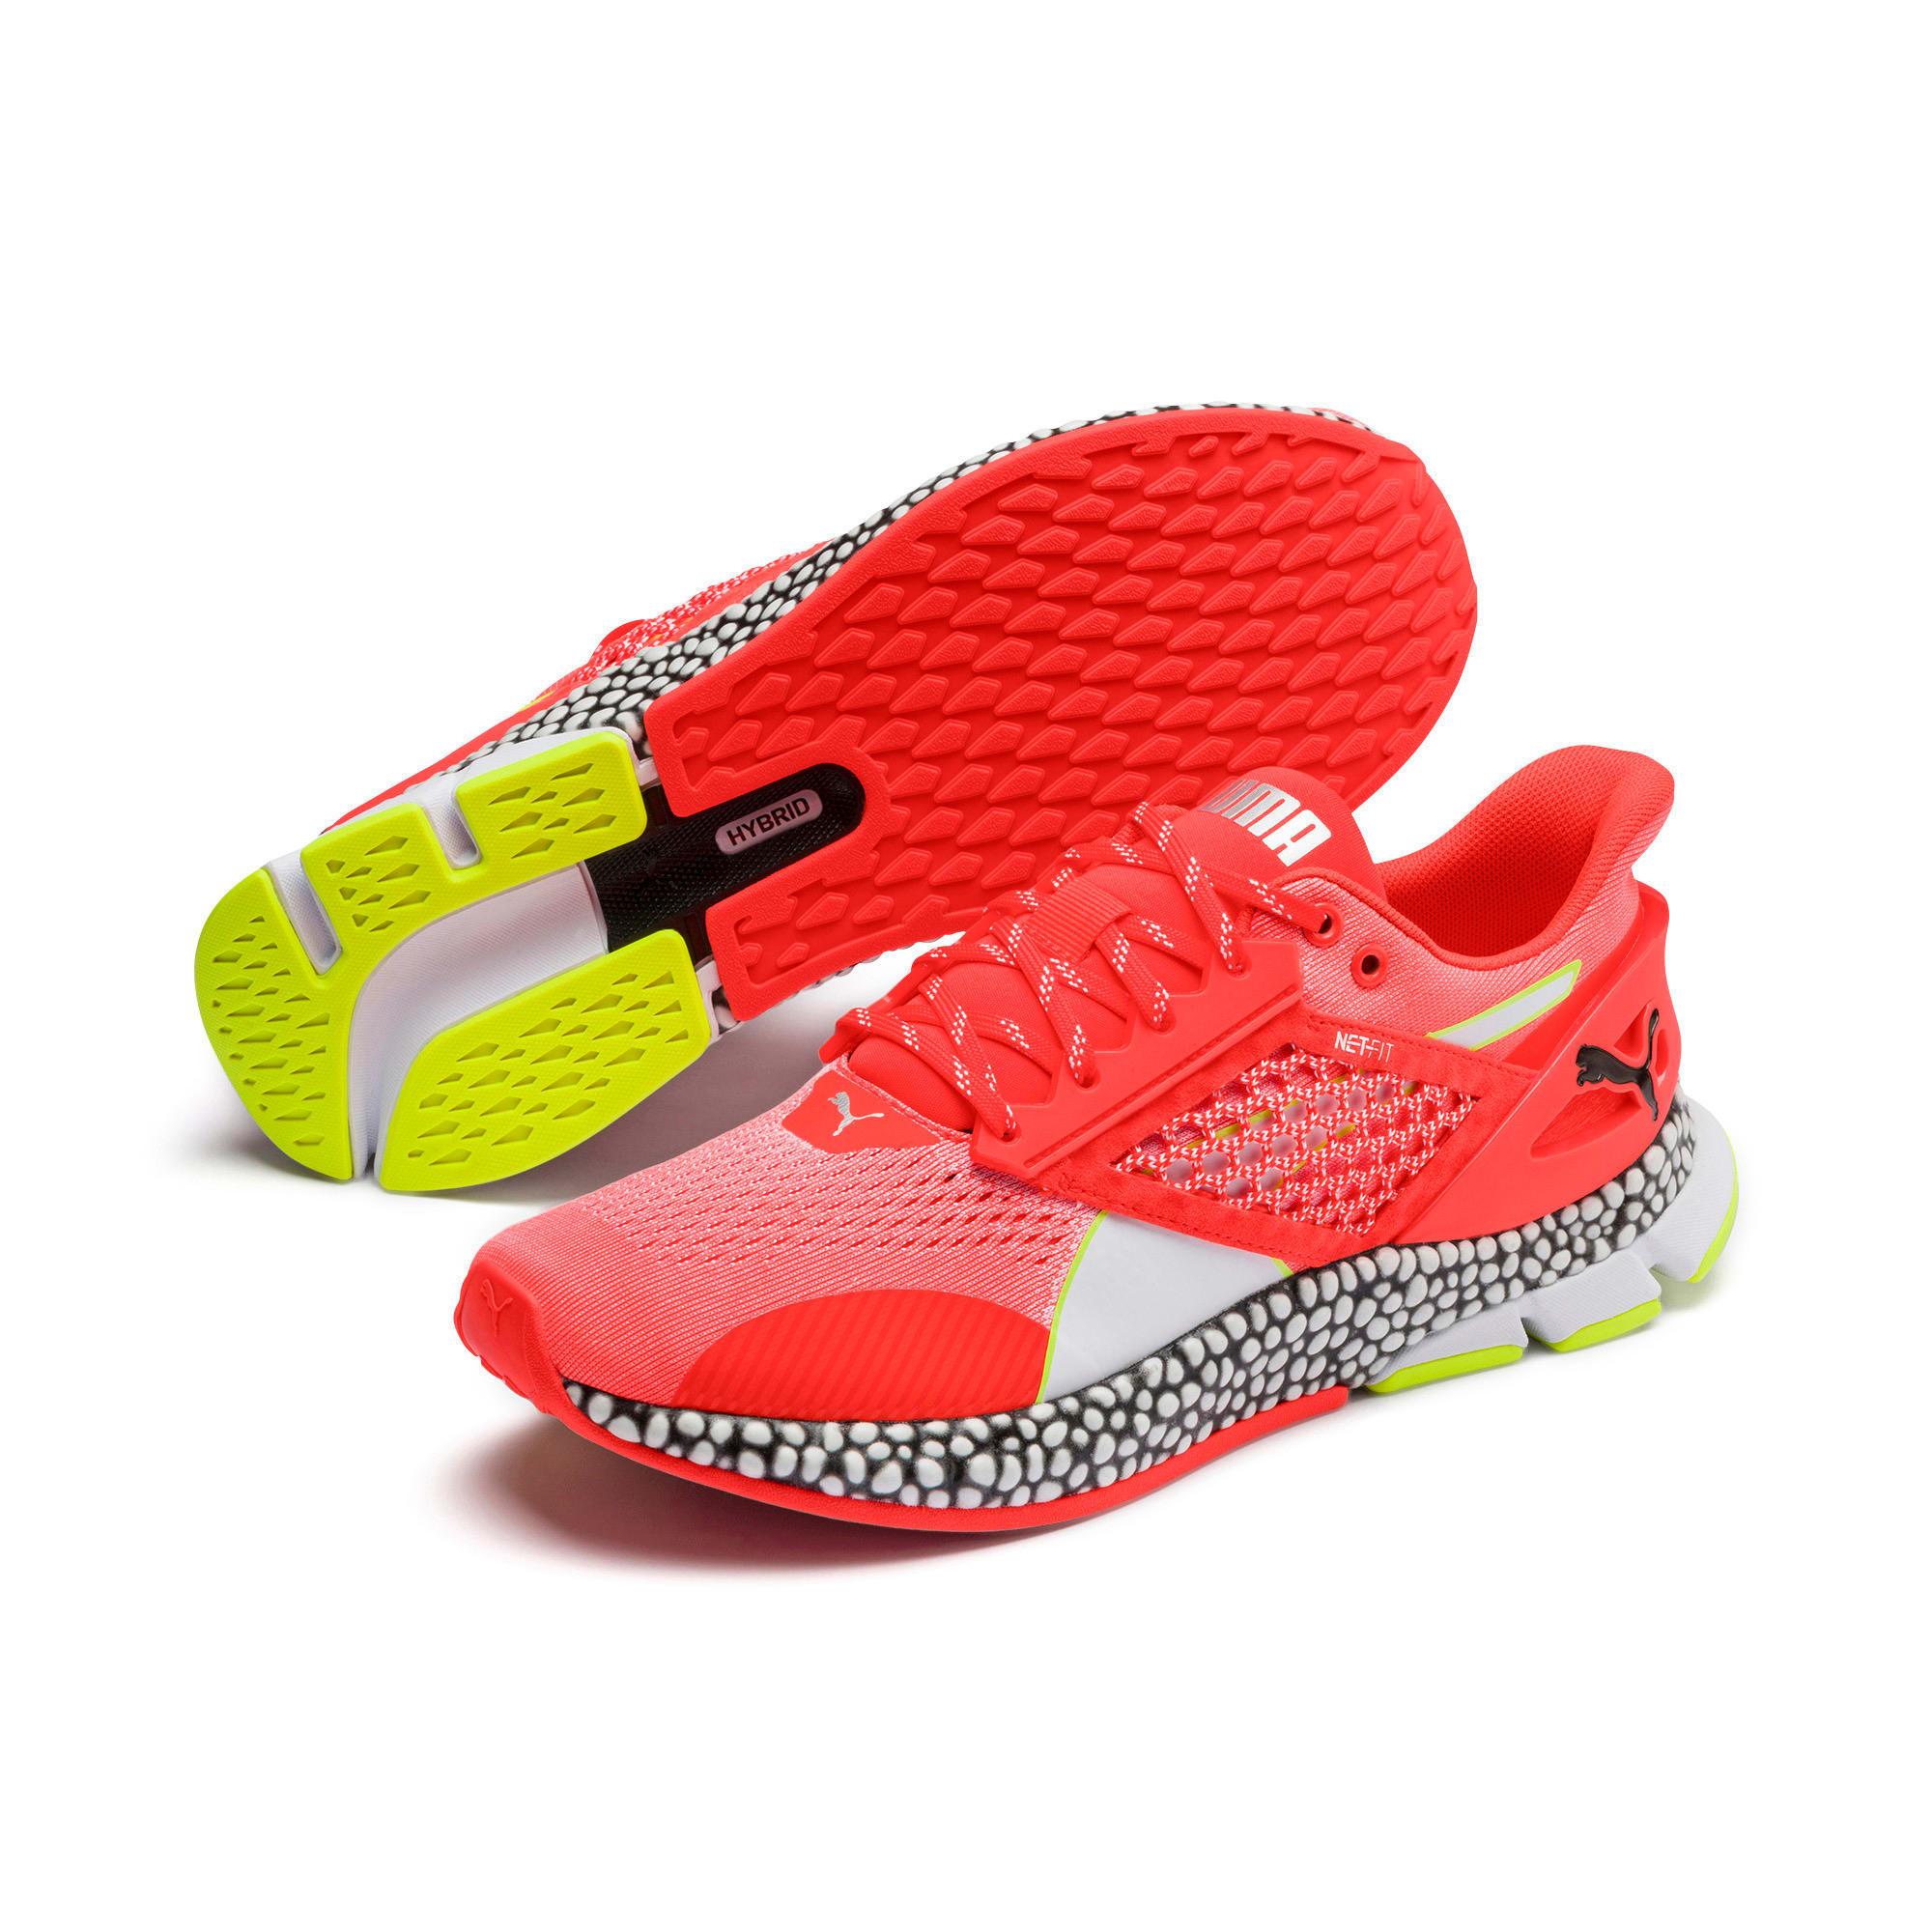 Thumbnail 2 of HYBRID Astro Men's Running Shoes, Nrgy Red-Puma Black, medium